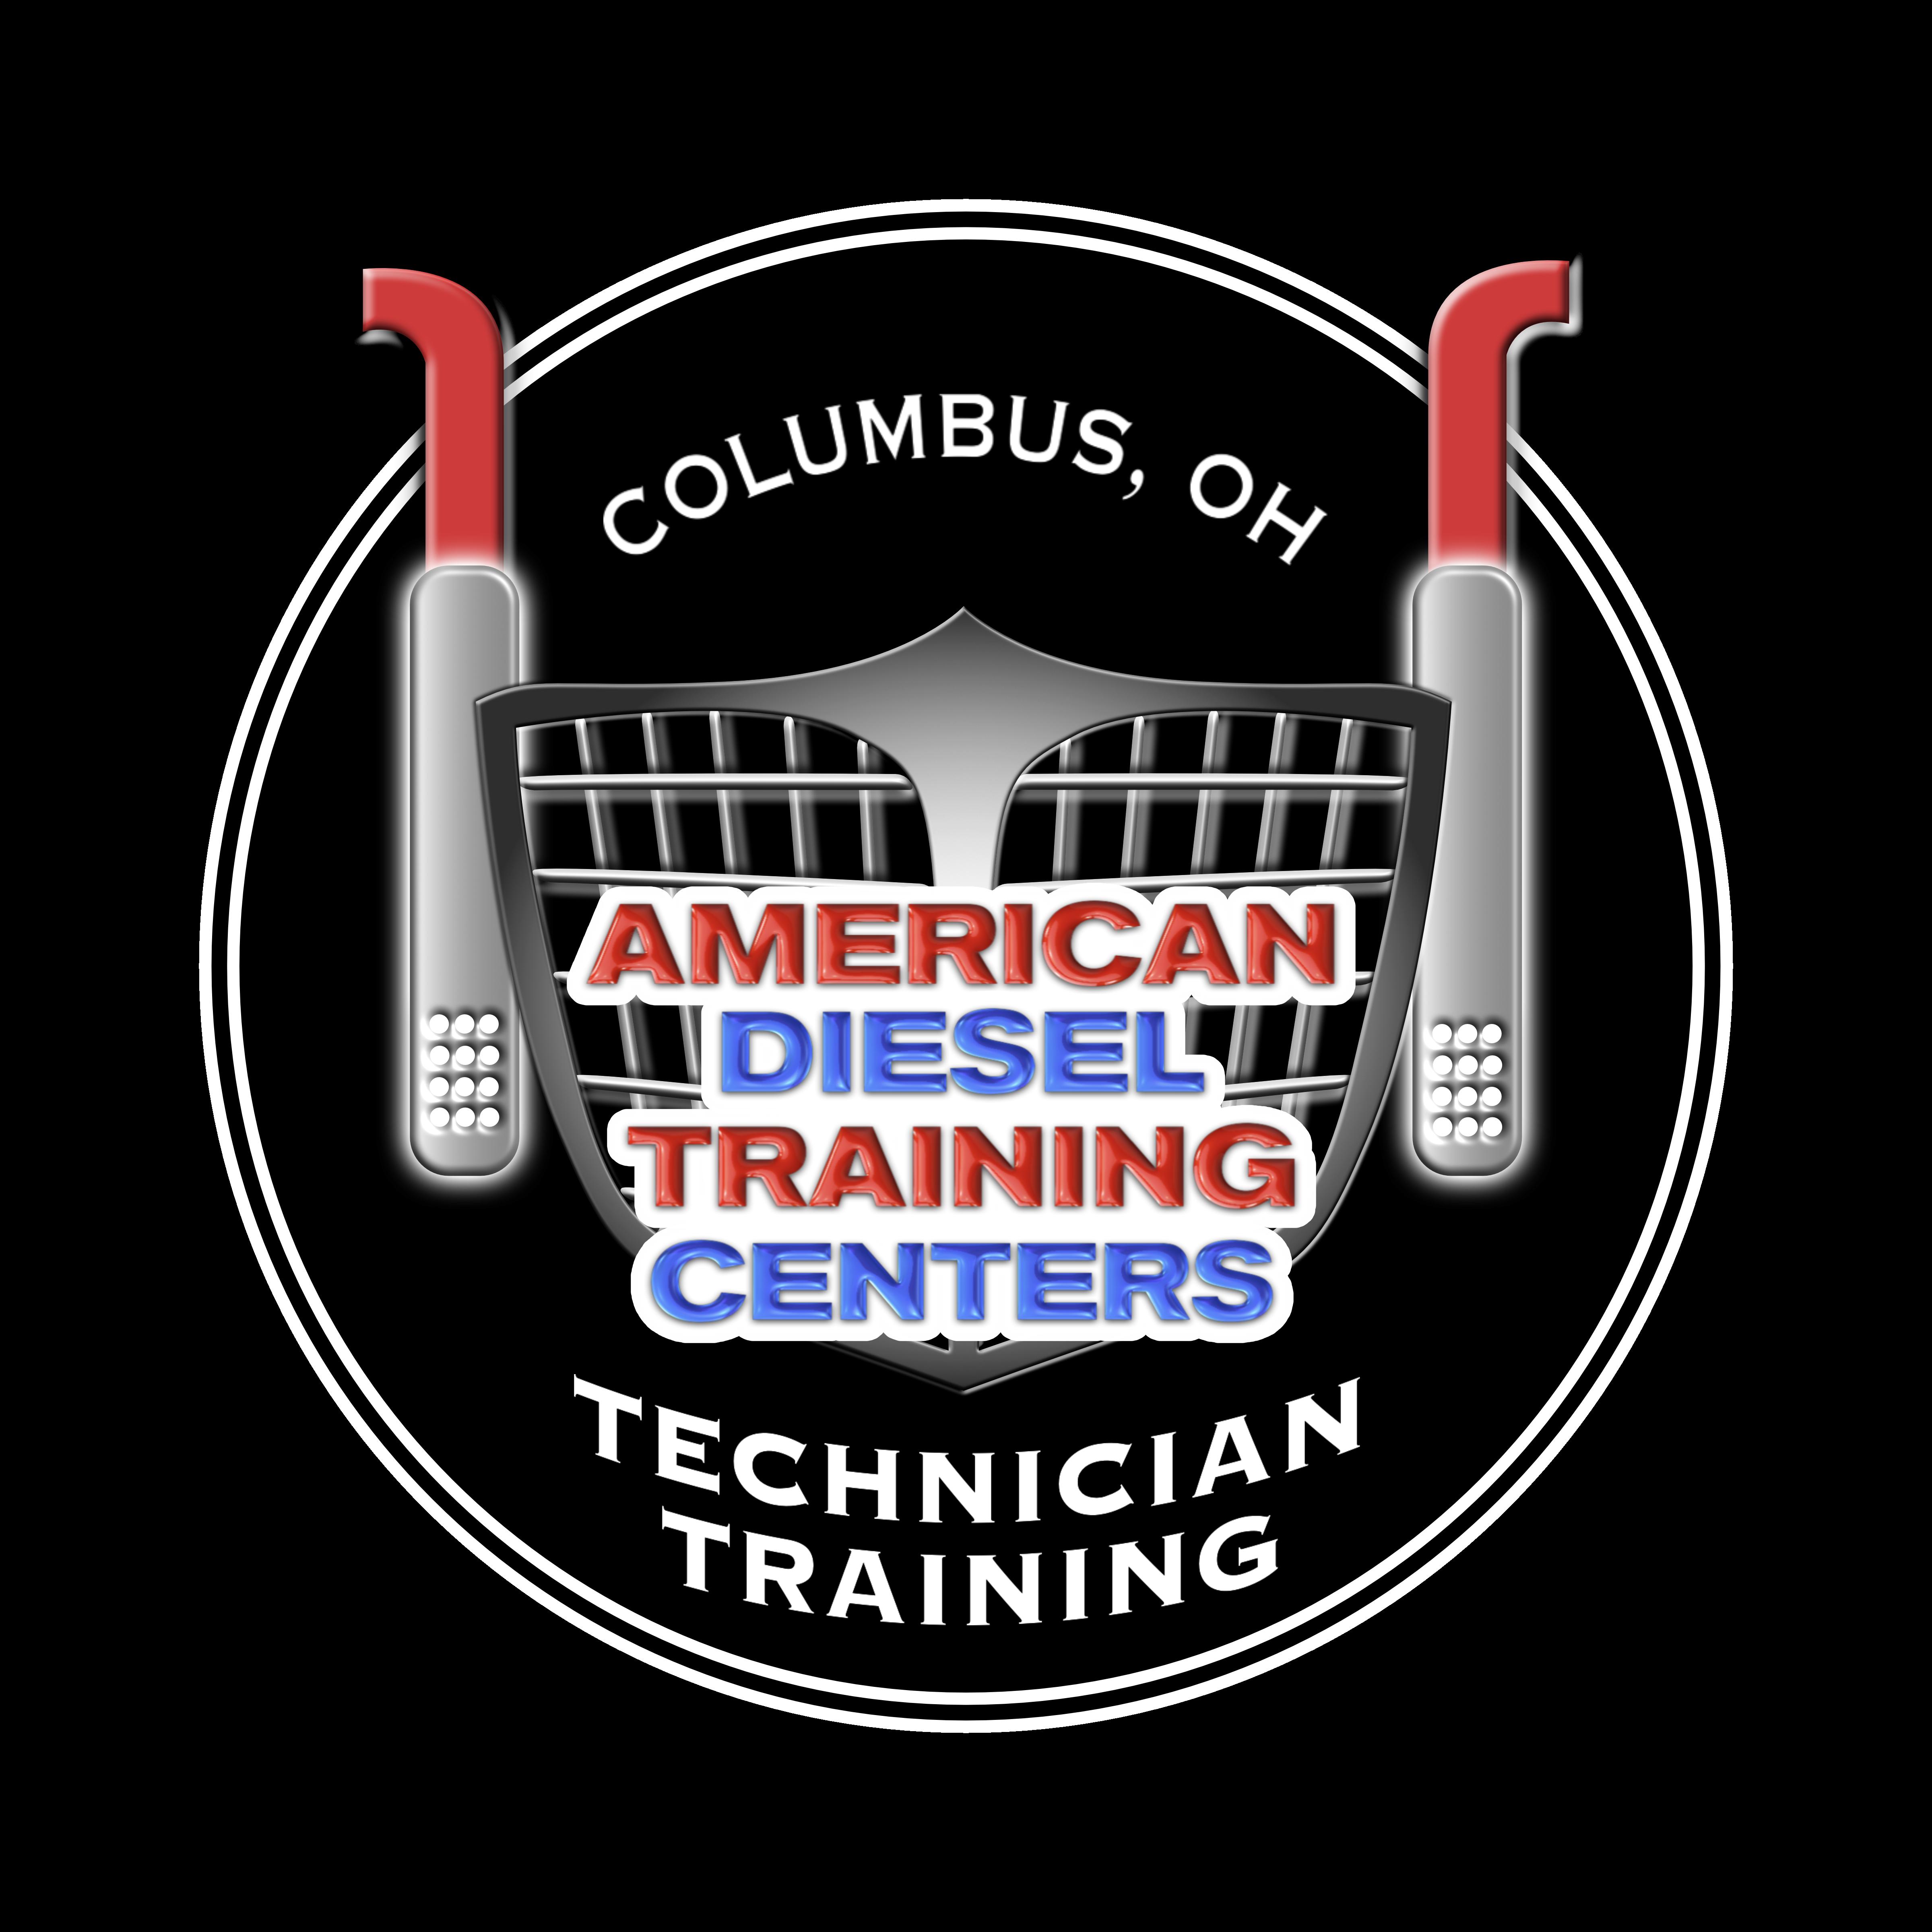 American Diesel Training Company